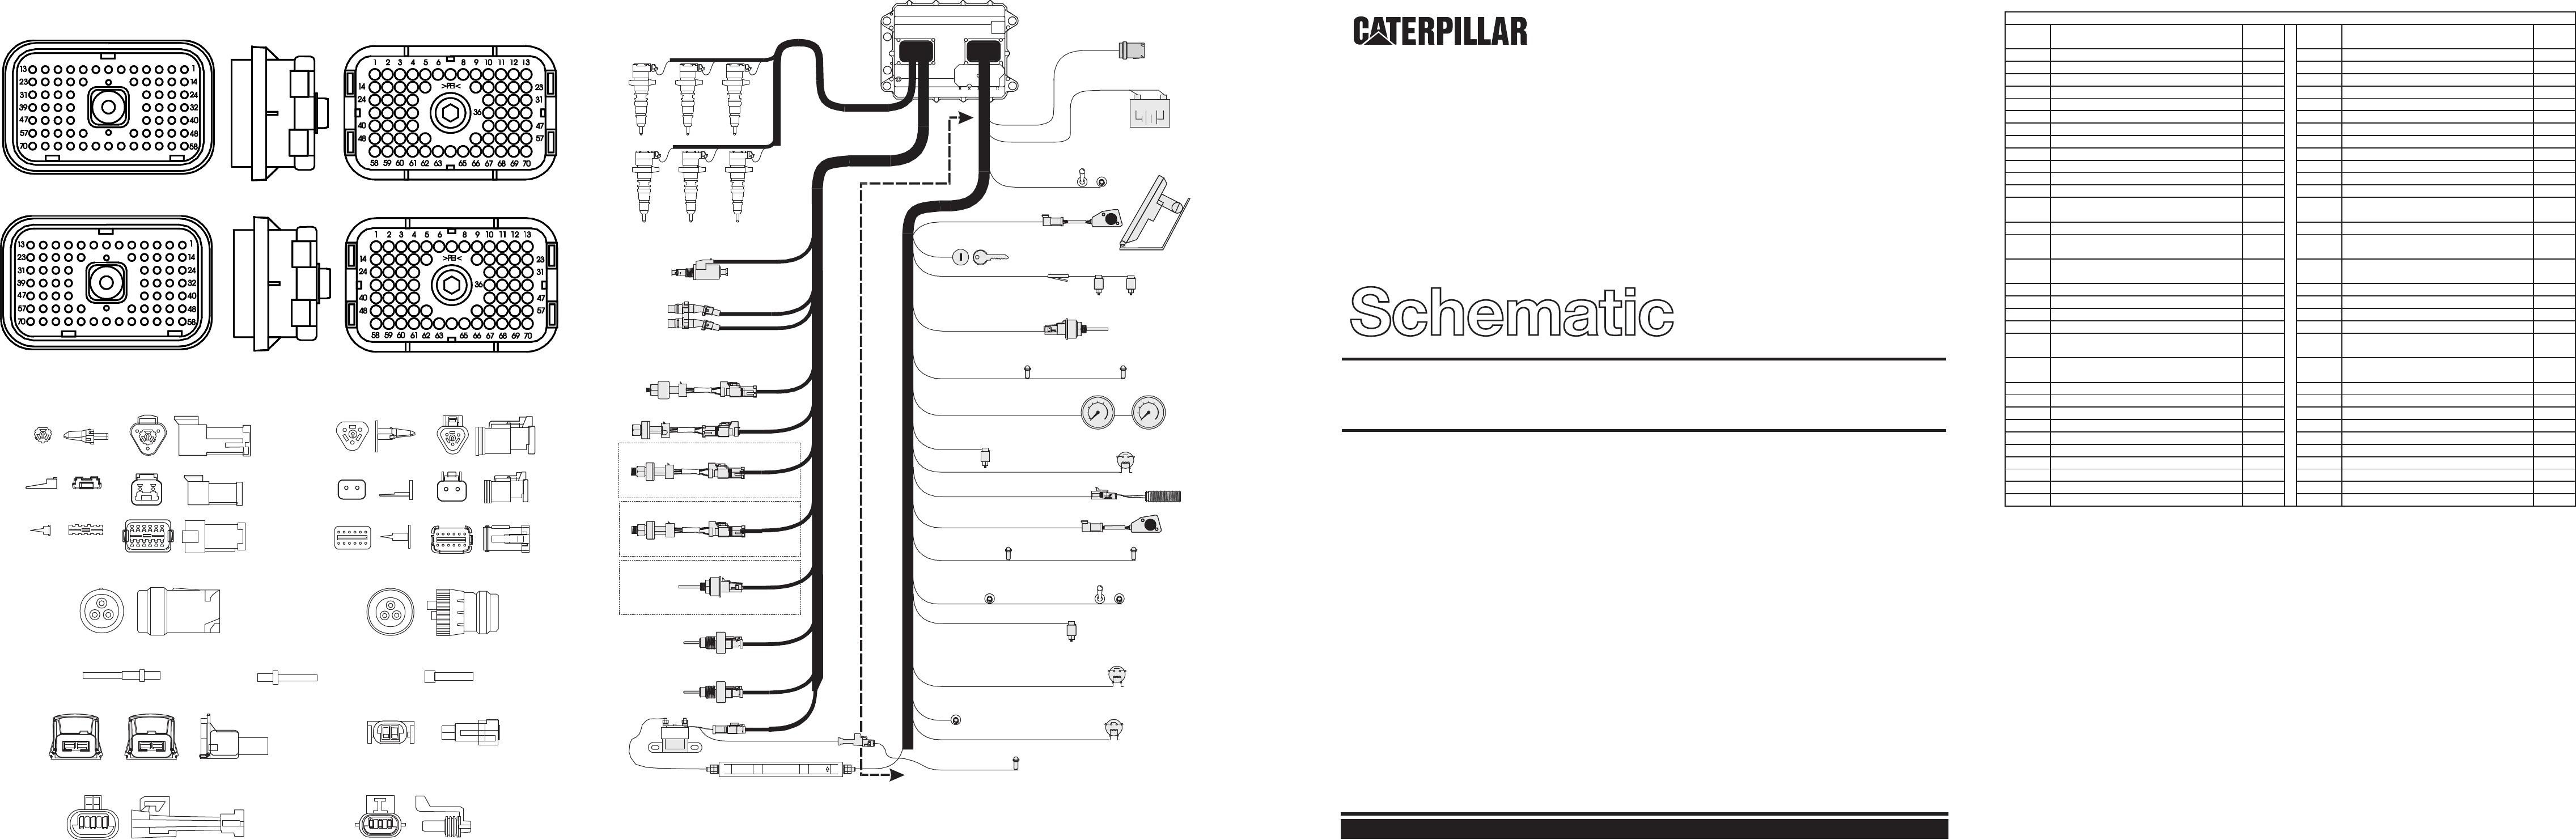 Cat 3126 Engine Diagram Cat 3126 Intake Heater Wiring Diagram Of Cat 3126 Engine Diagram